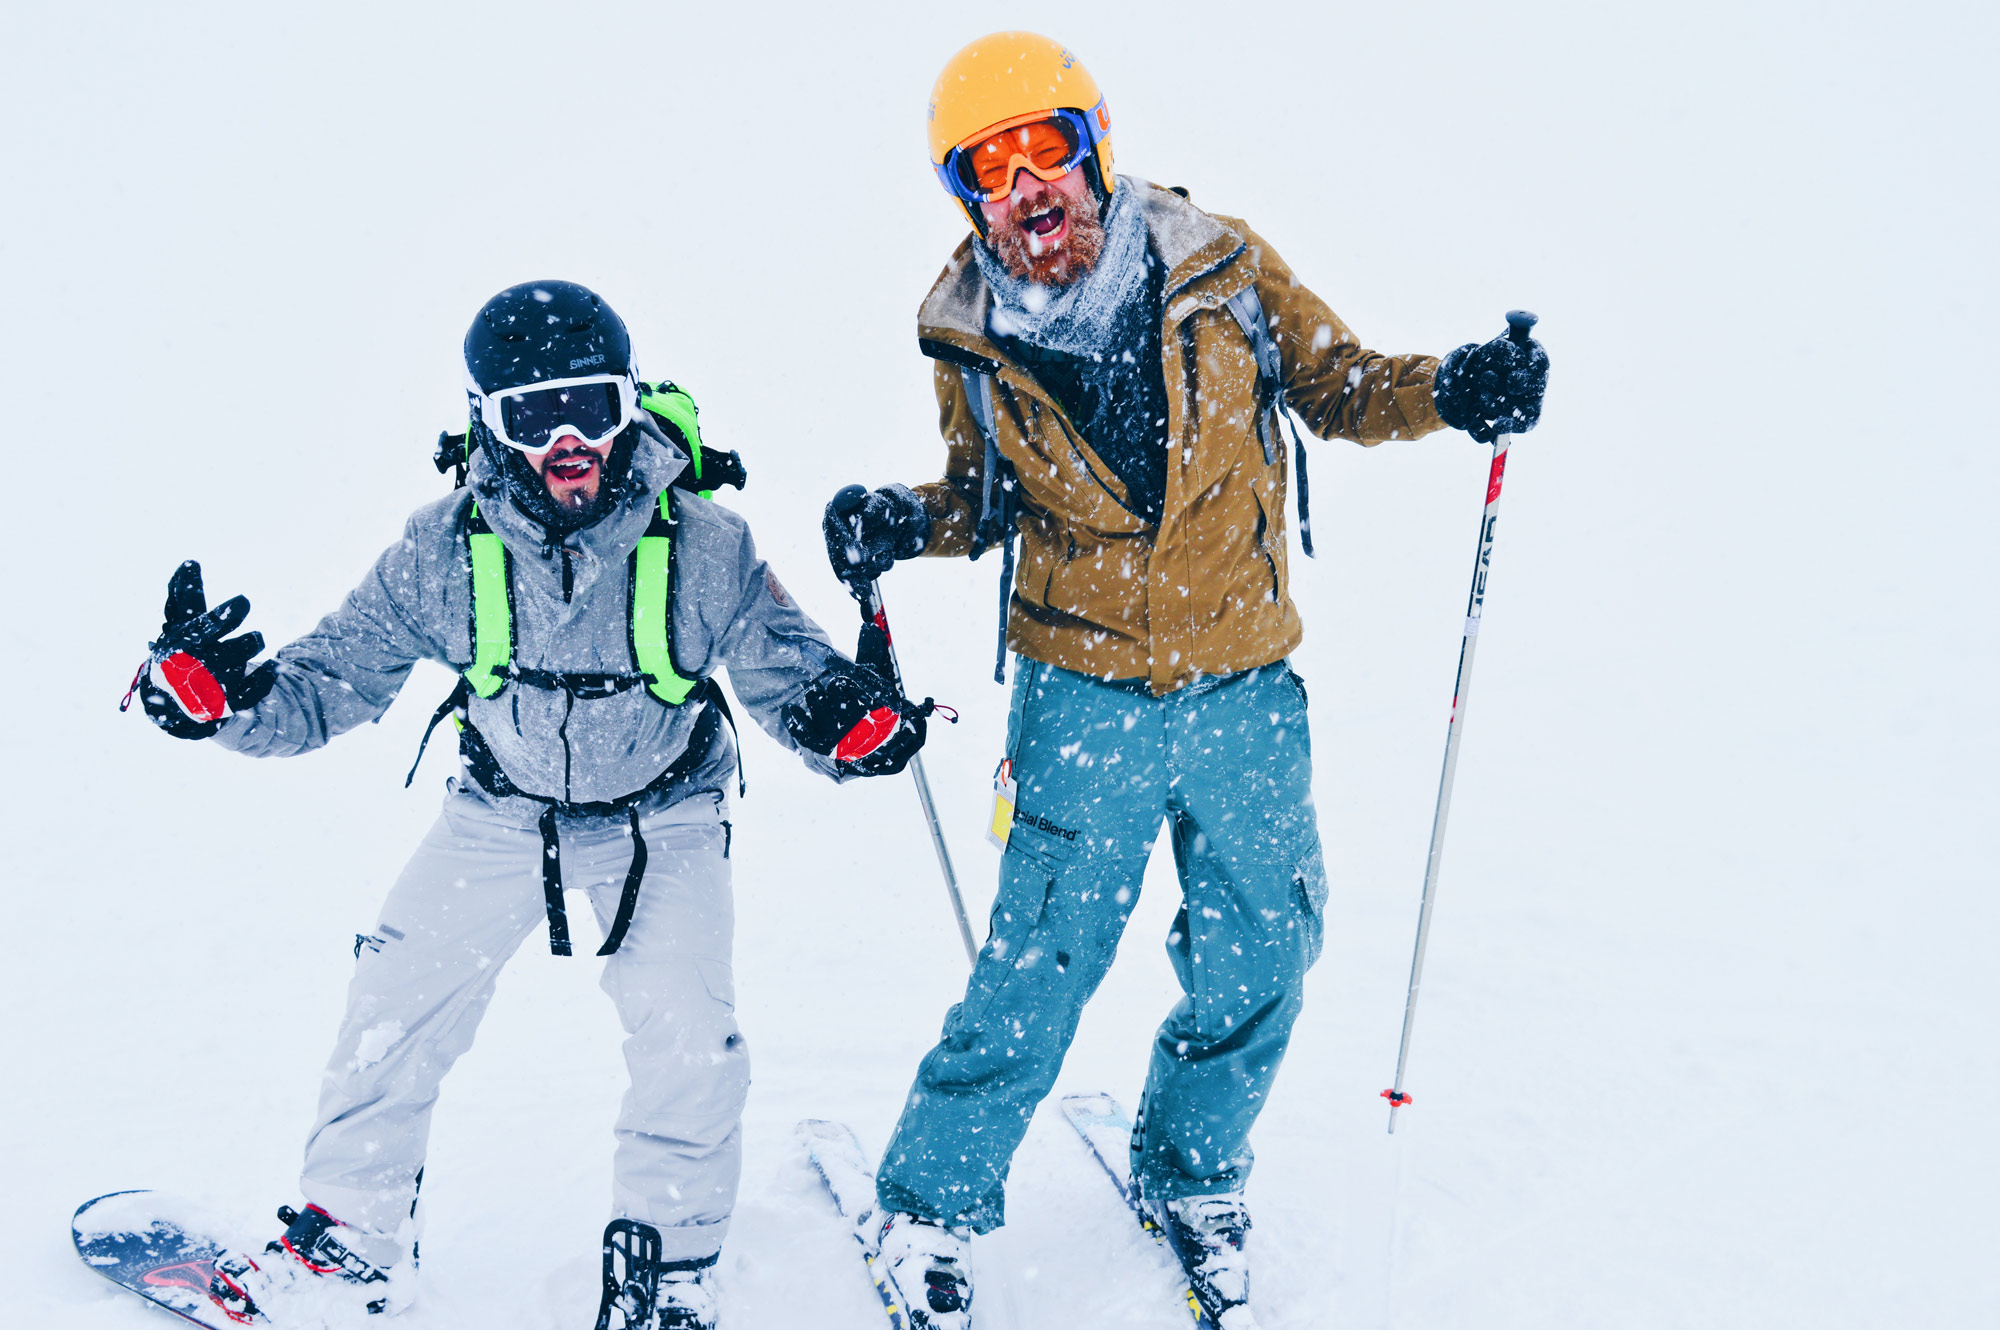 Gay Travel blogger Coupleofmen.com skiing and snowboarding | Top 13 Best Gay Ski Weeks Worldwide © CoupleofMen.com